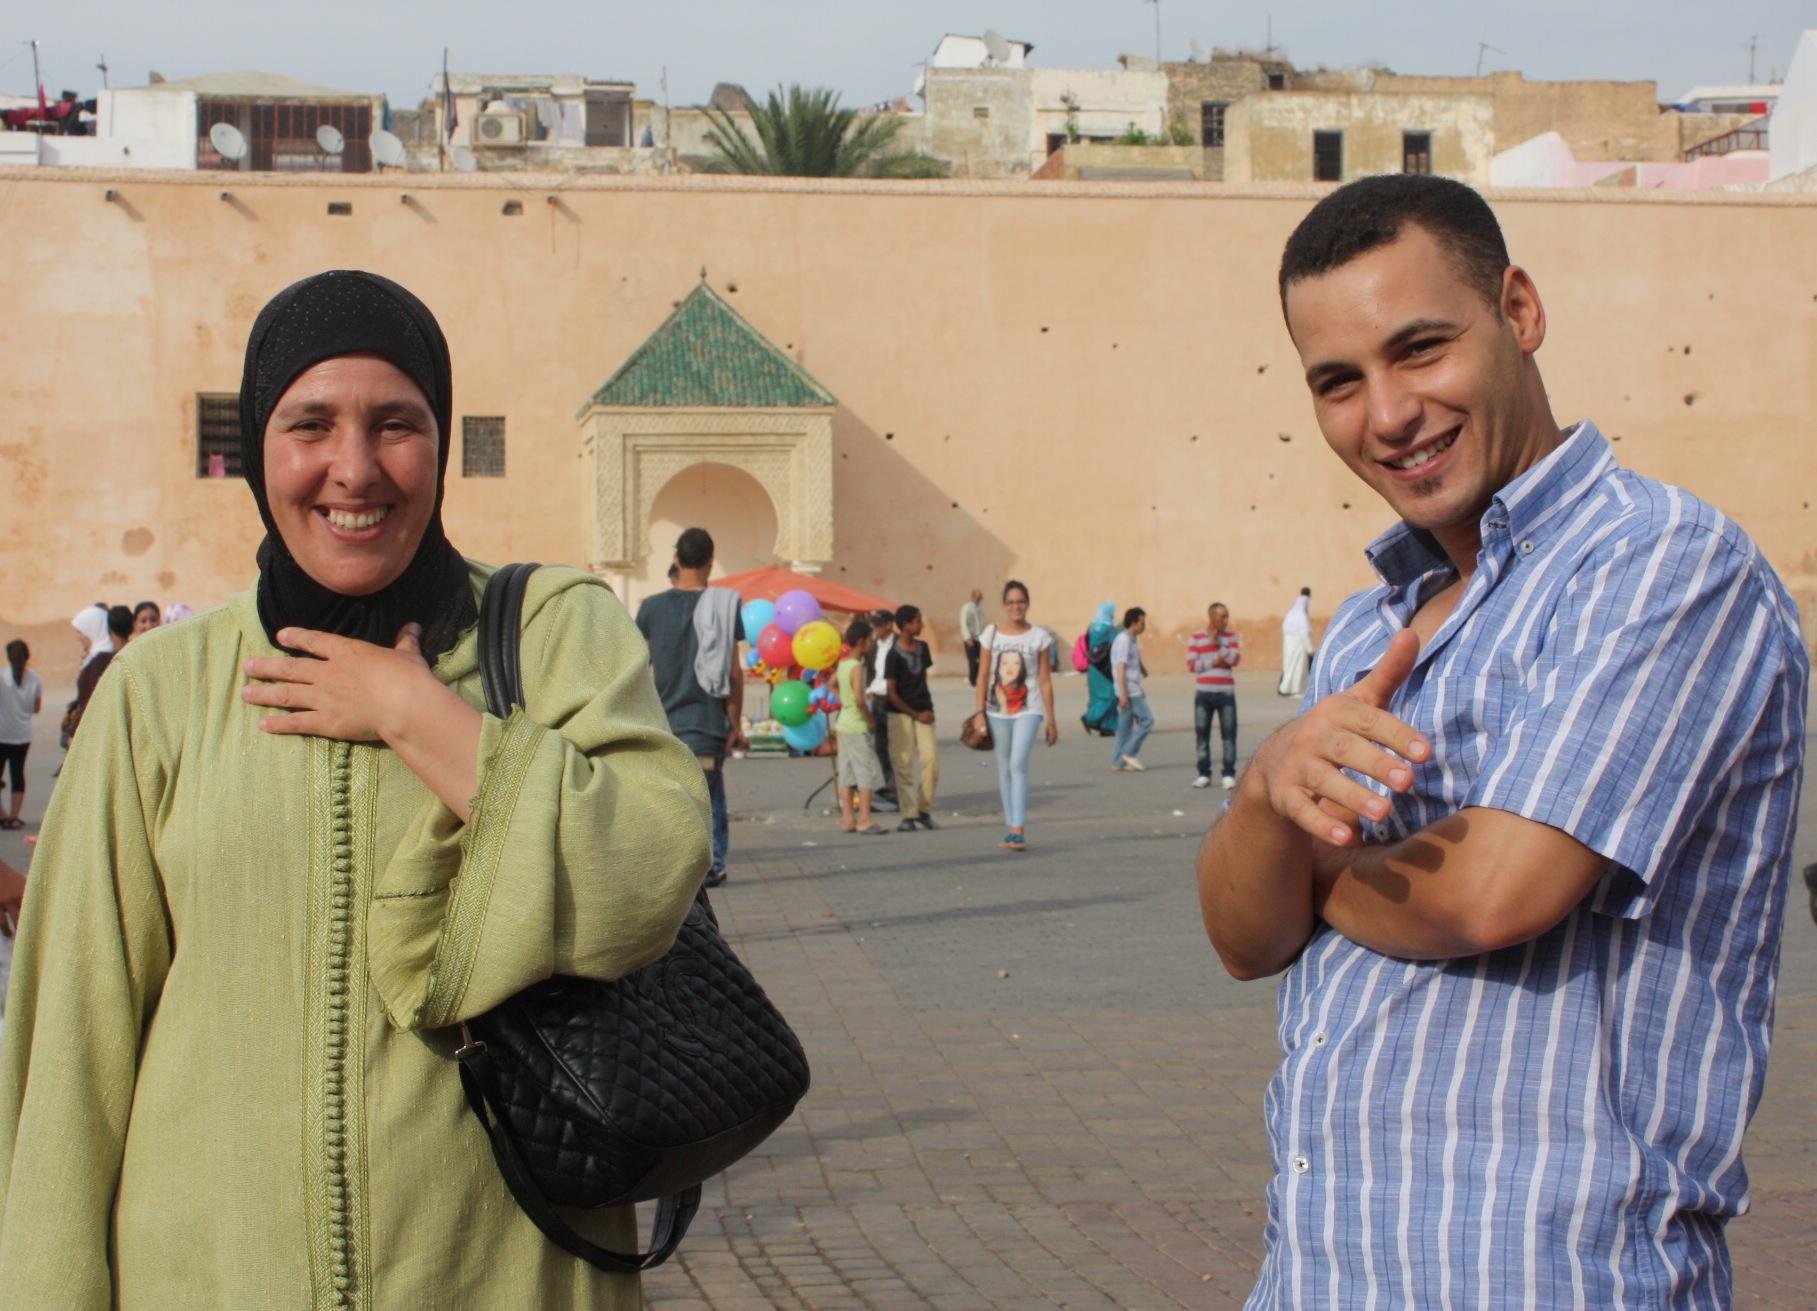 Rabha and Omar meet in Meknes to begin training Hicham.